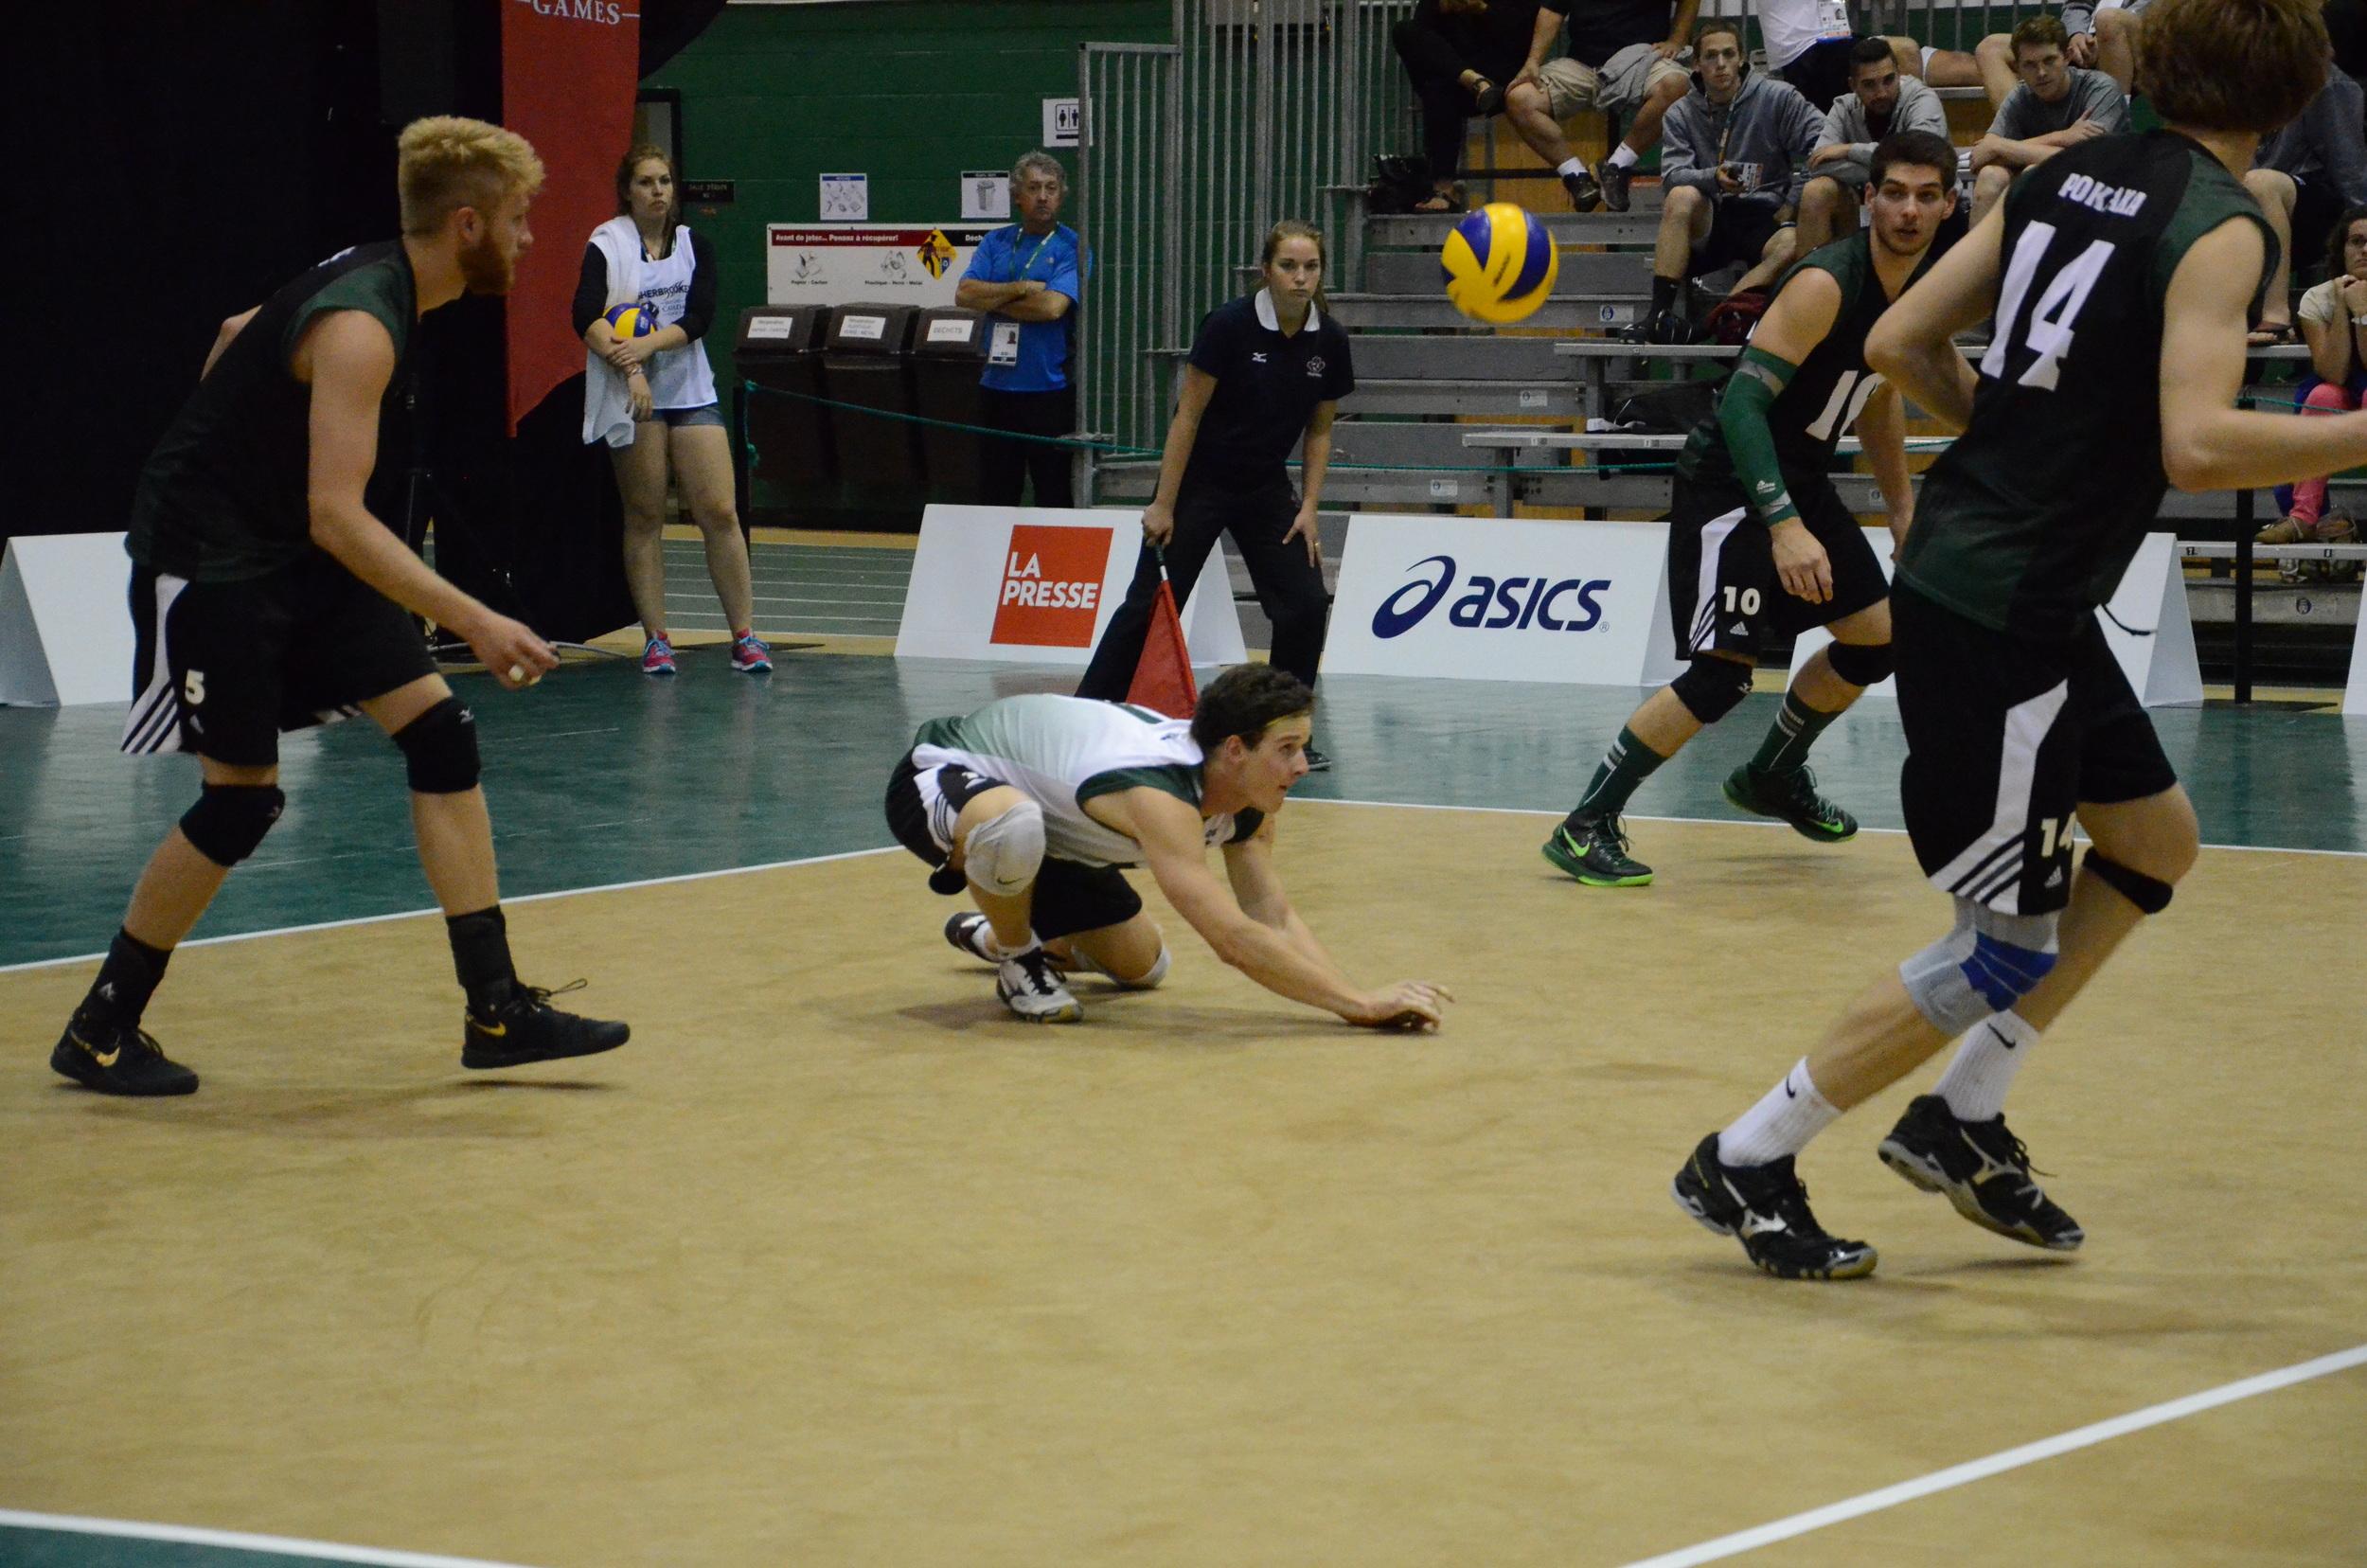 Team Saskatchewan receives a serve during a match at the Canada Games